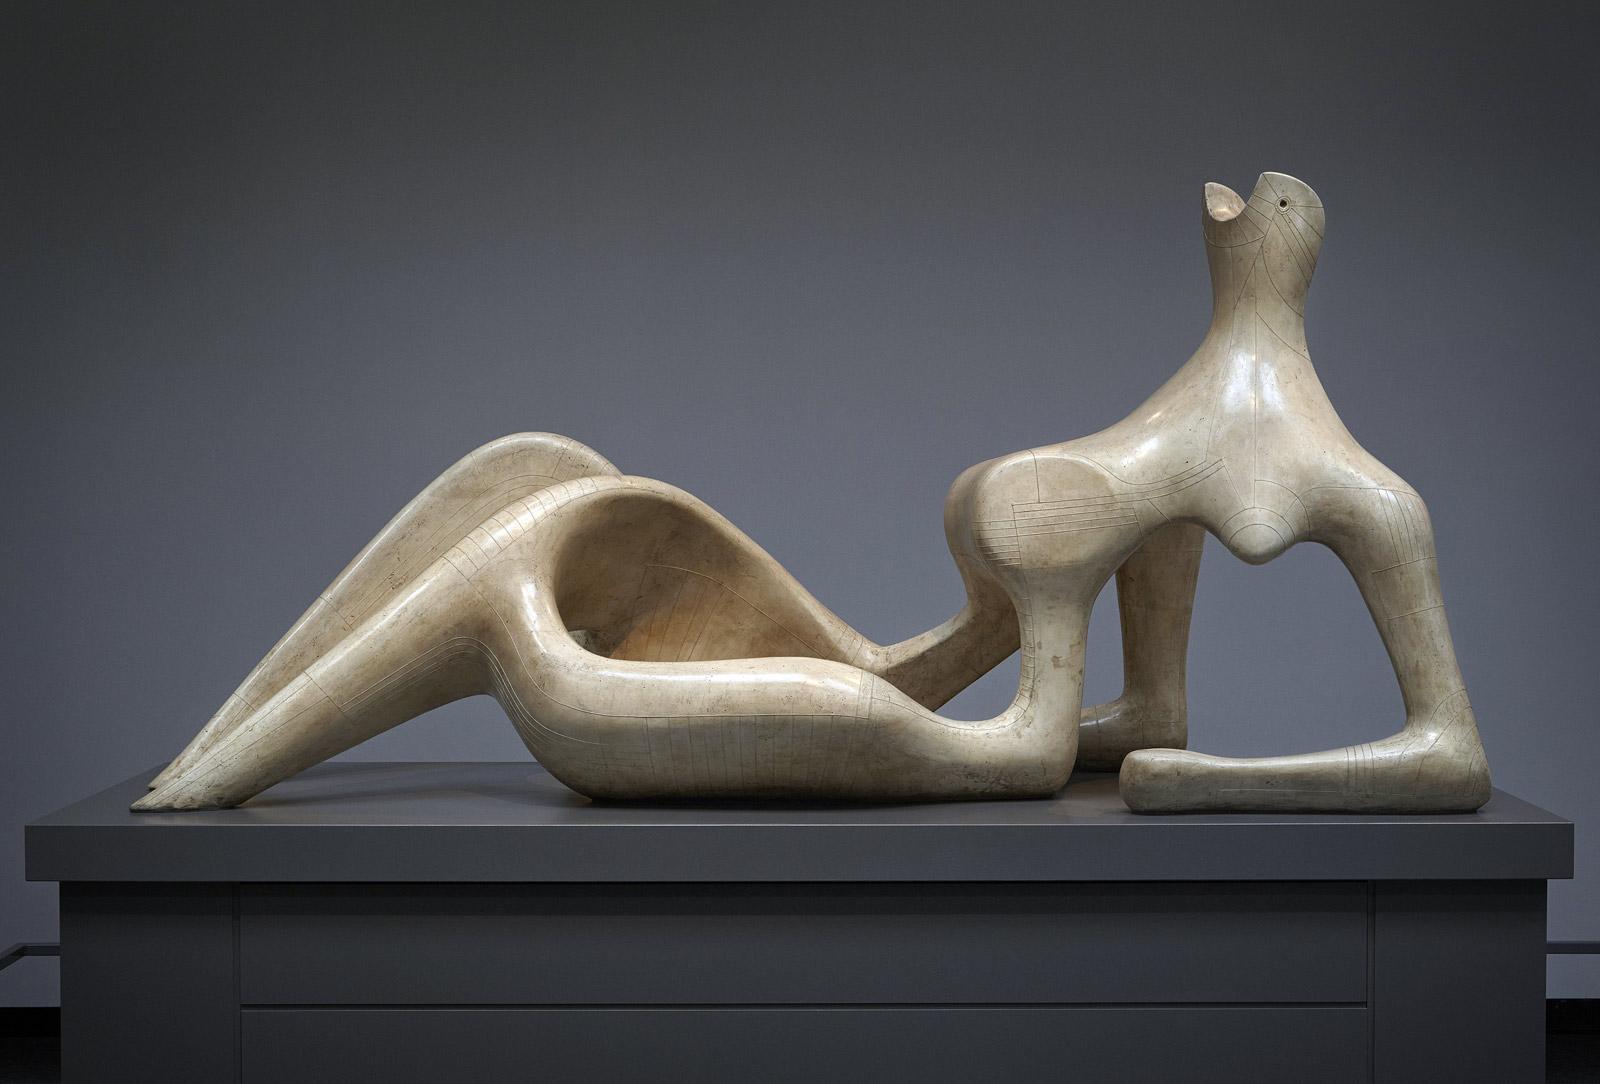 Henry Moore. u0027Reclining Figureu0027 1951 & Henry Moore Reclining Figure | Art Blart islam-shia.org